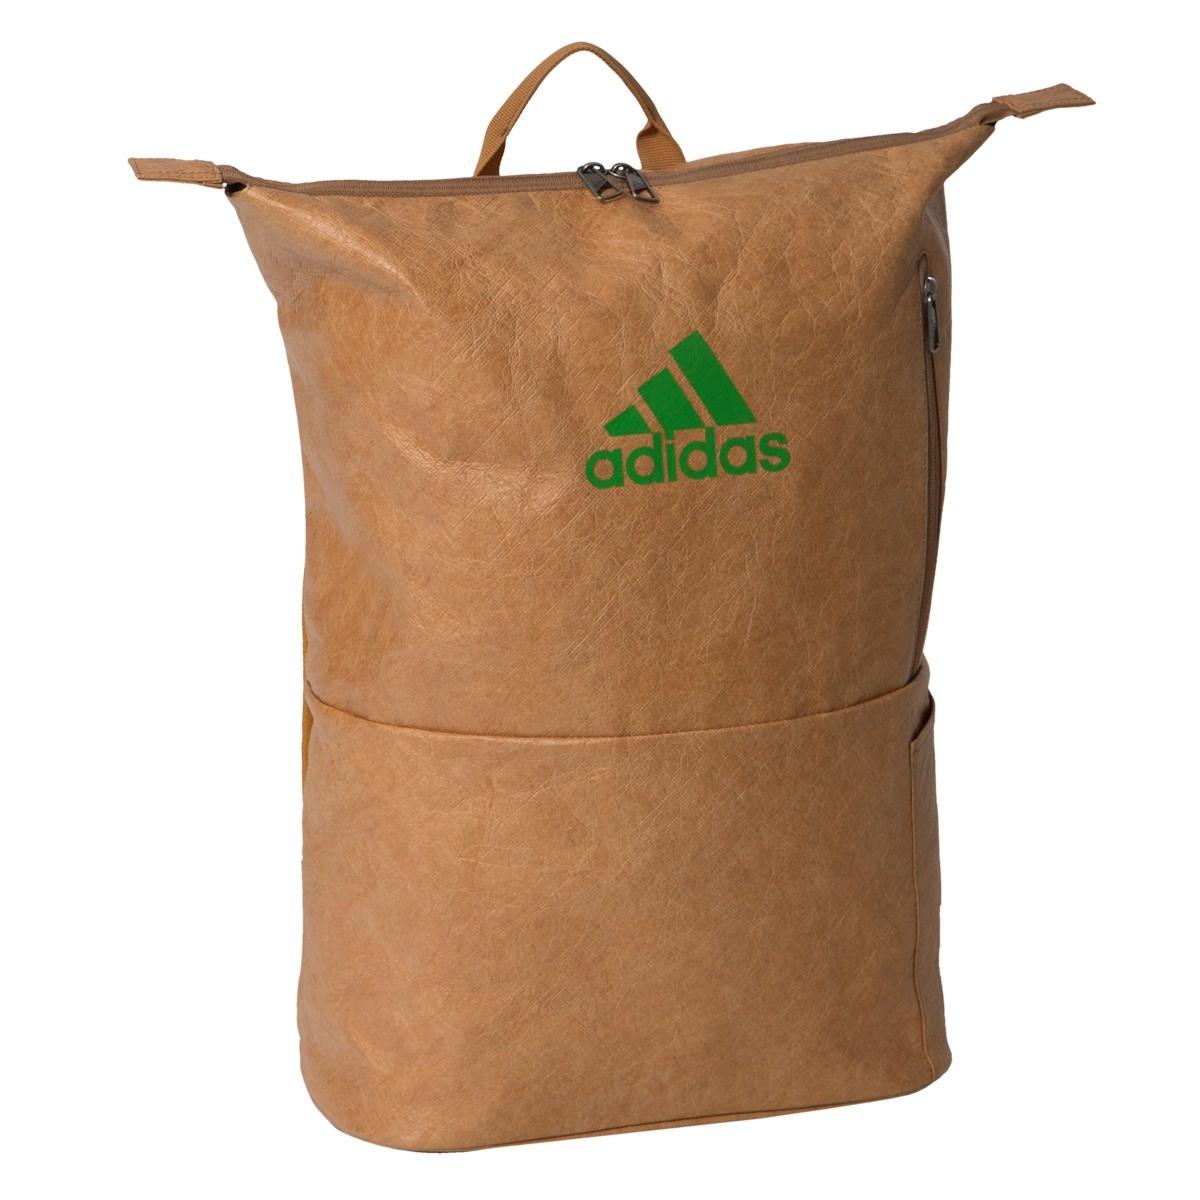 Adidas Multigame 2.0 Backpack #GREENPADEL-1